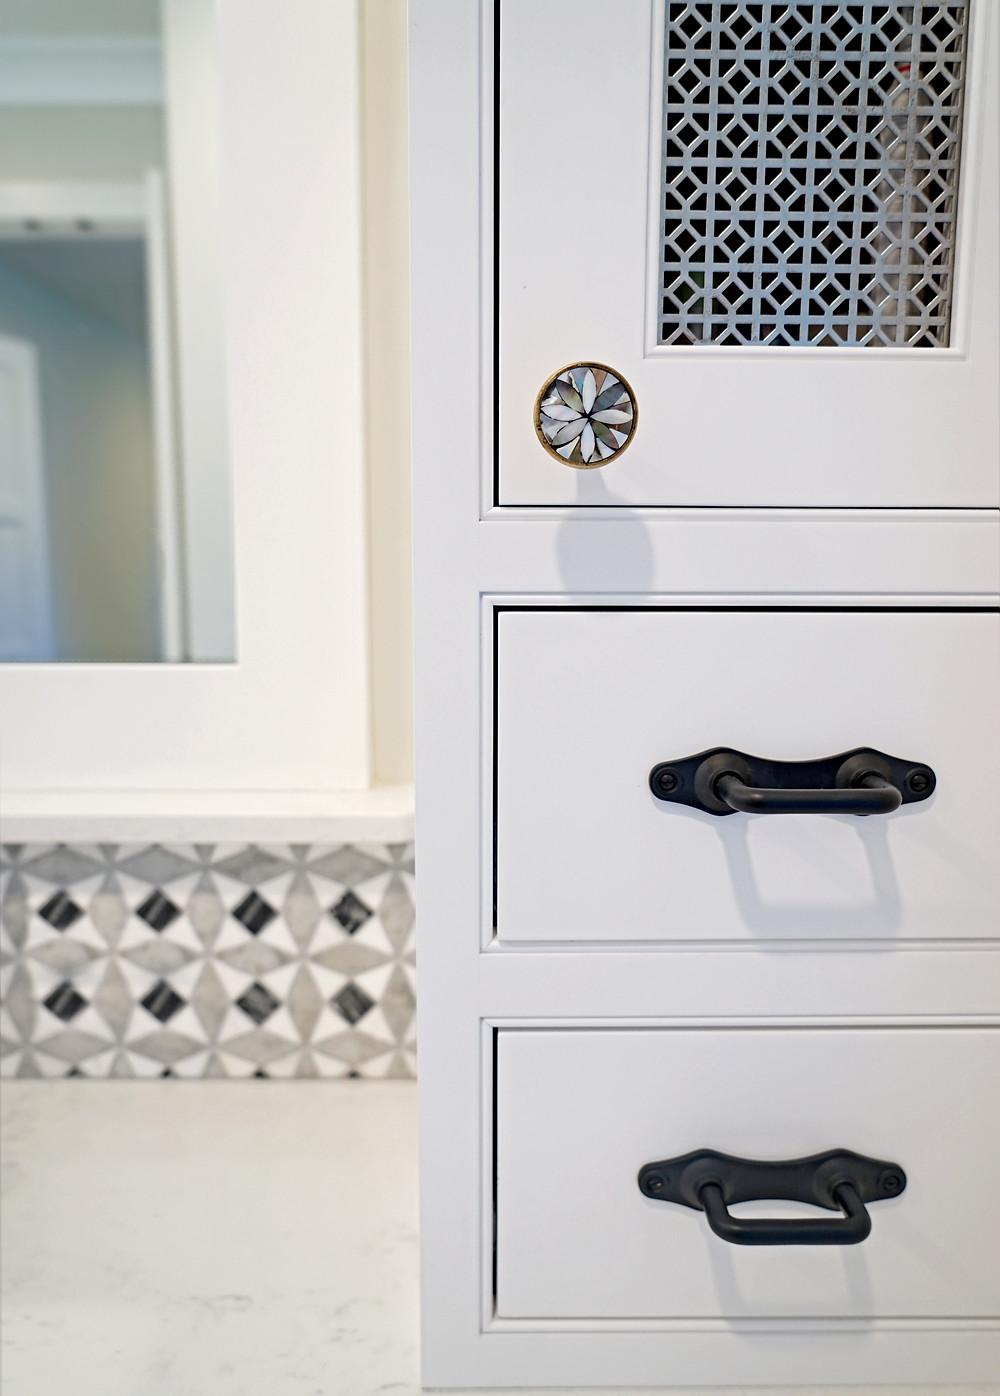 Hardware details:  knobs by Anthropologie & pulls by Rejuvenation